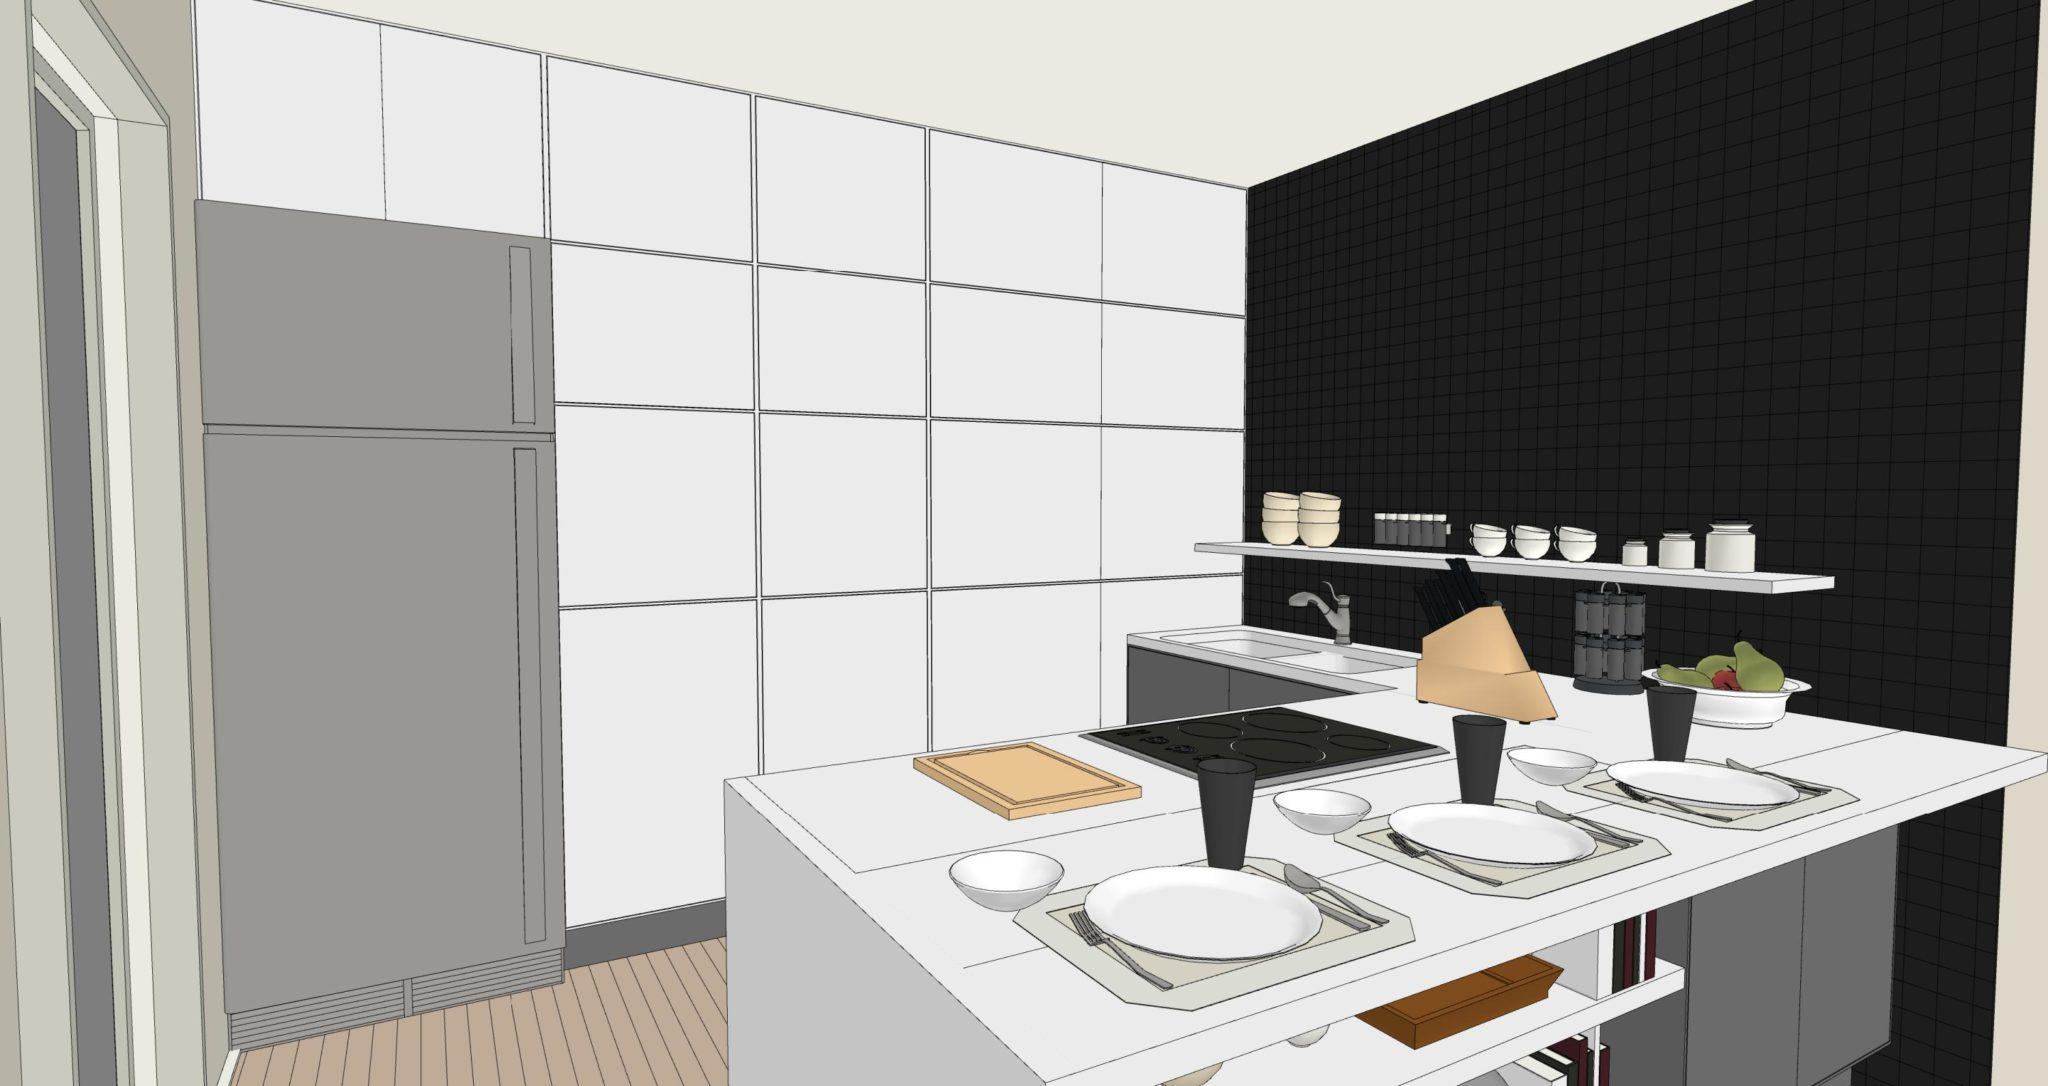 Cucine senza pensili sopra gu63 regardsdefemmes - Cucina senza piastrelle ...